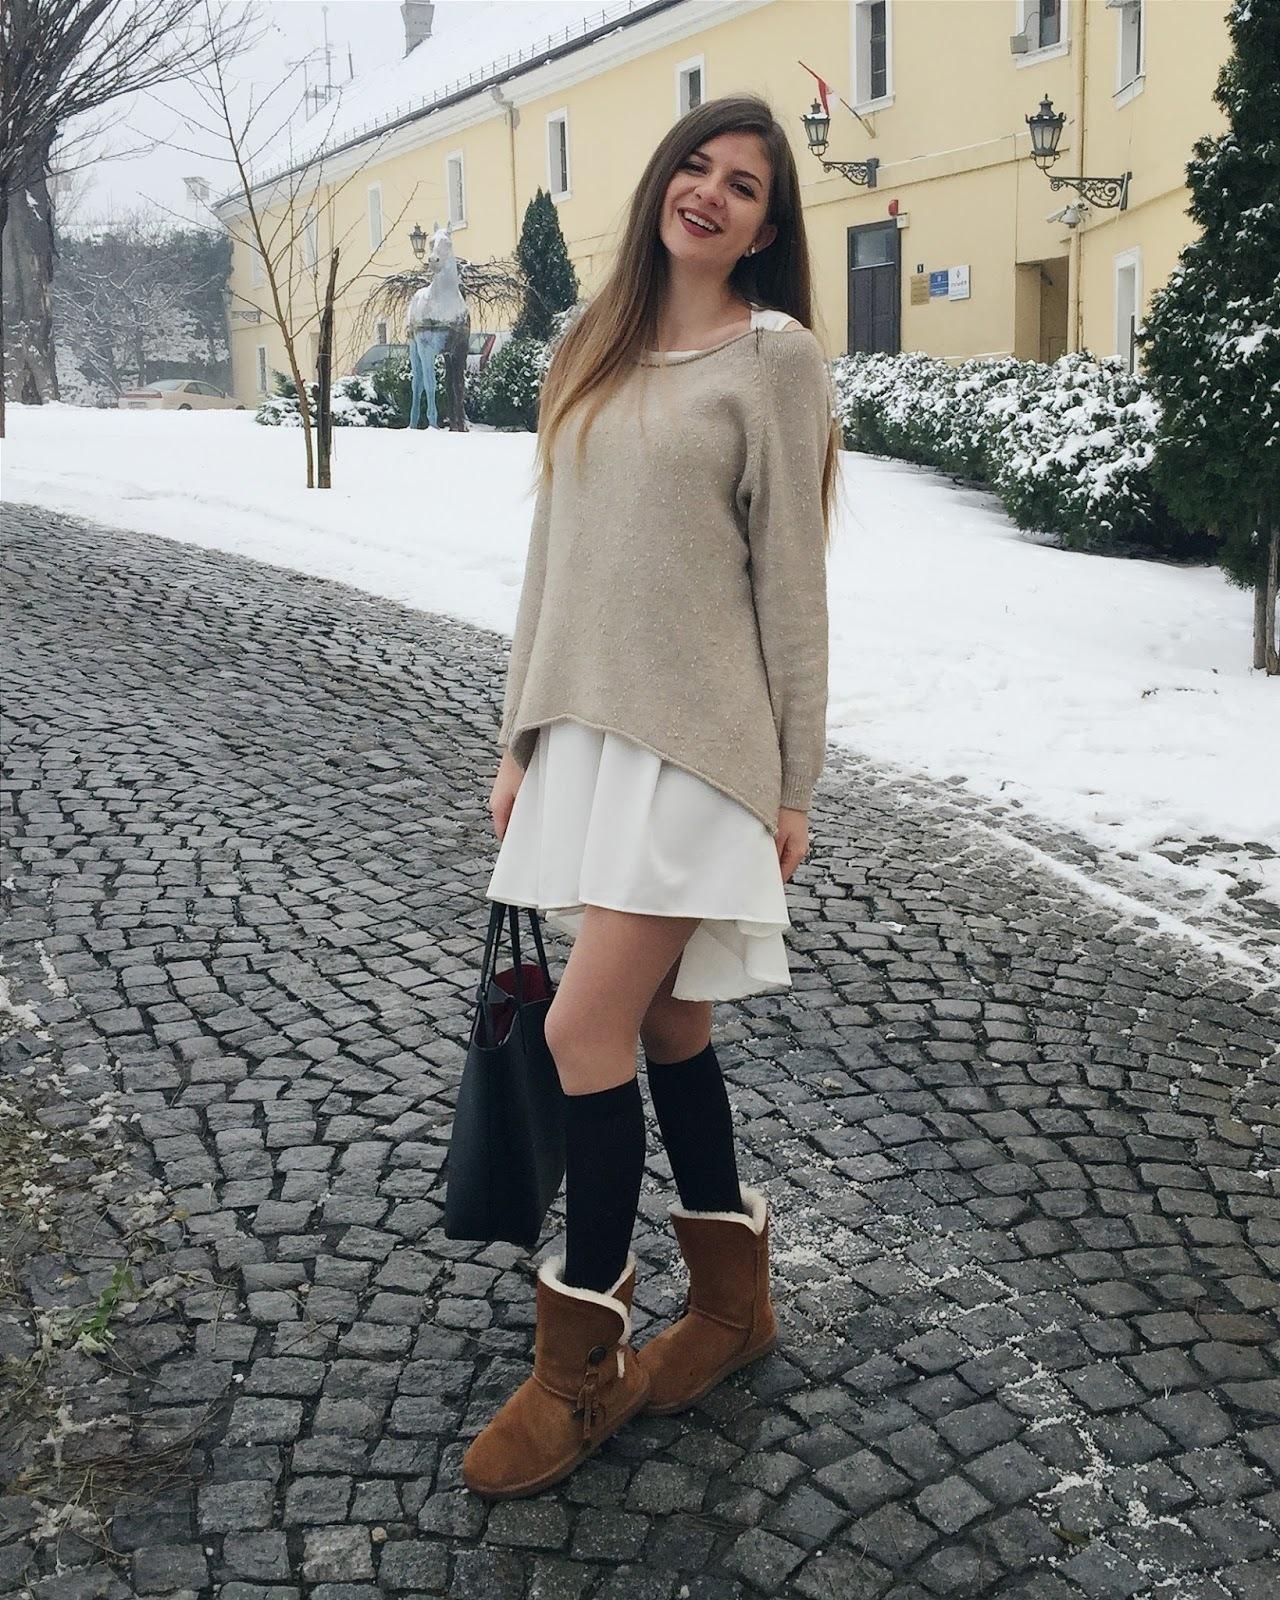 Braune Ugg Stiefel Kombinieren 13 Kombinationen Damenmode